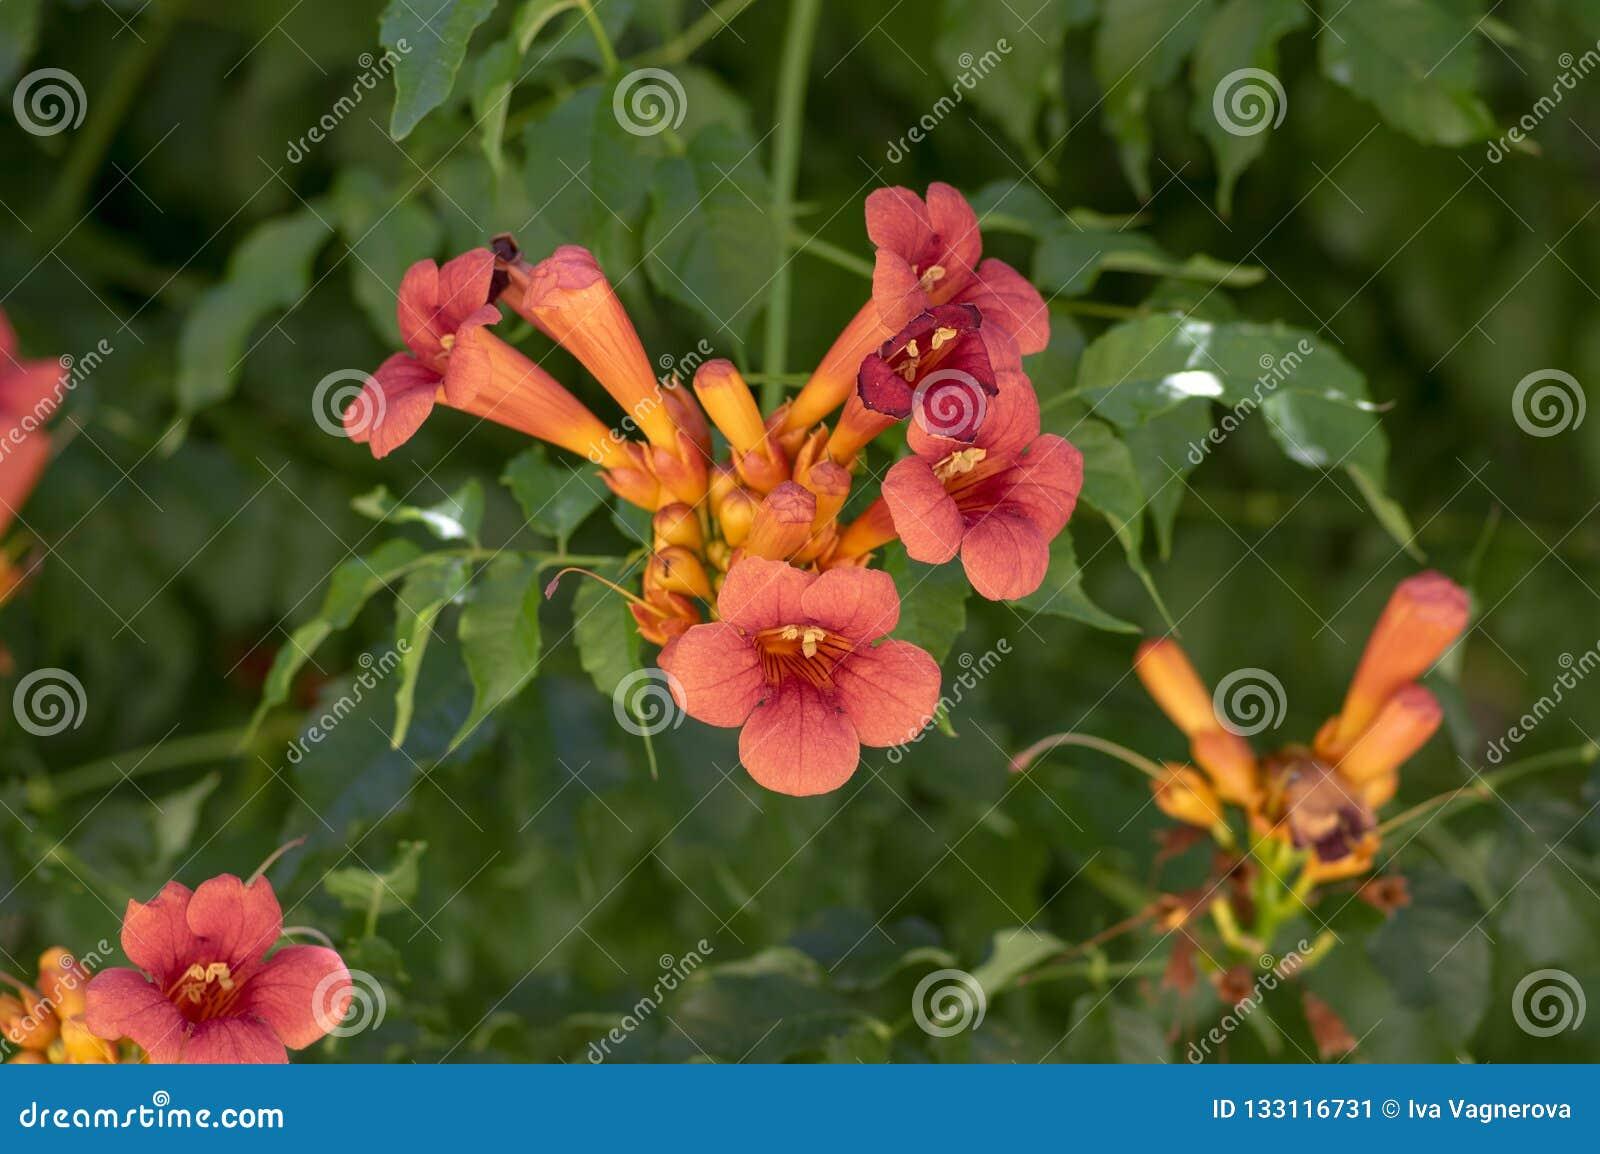 Campsis grandiflora orange gul blomma växt, grupp av blommor på buskefilialer i blom